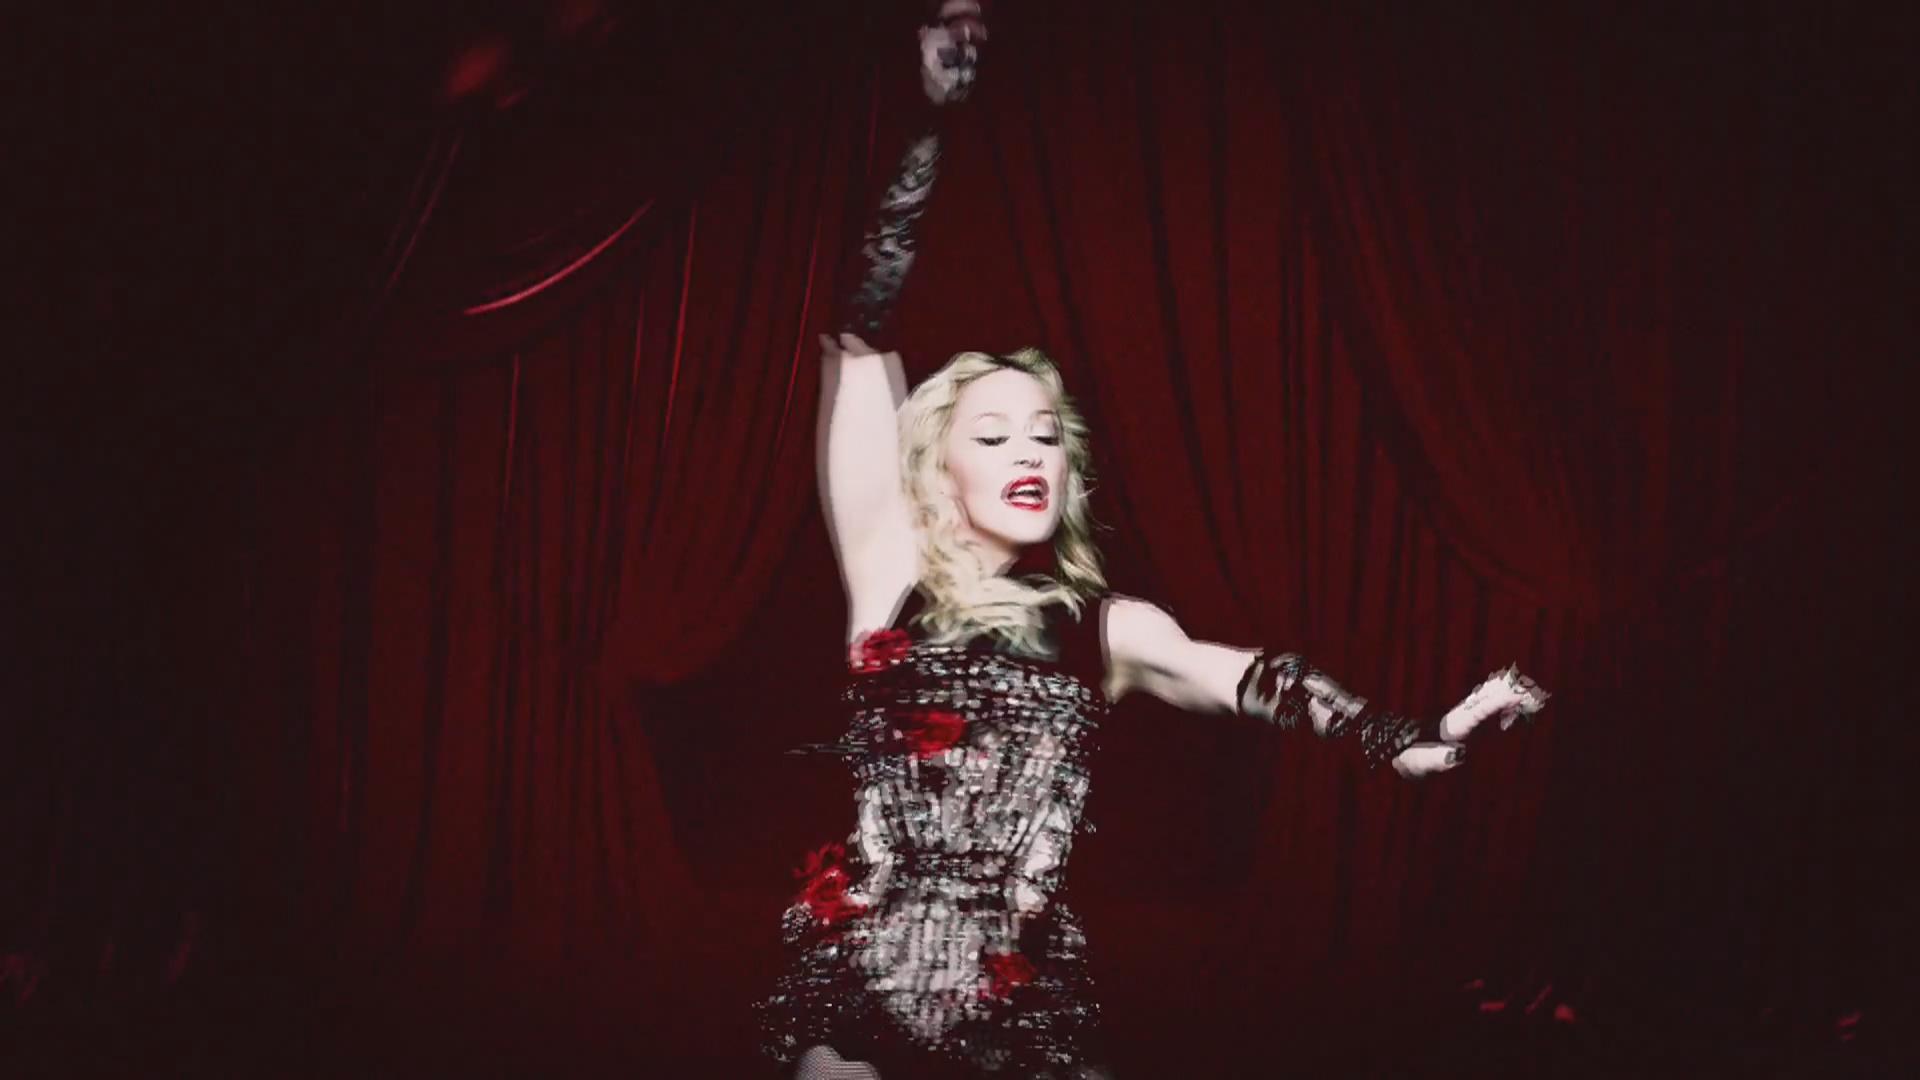 Madonna Living For | madonna living for love clipe